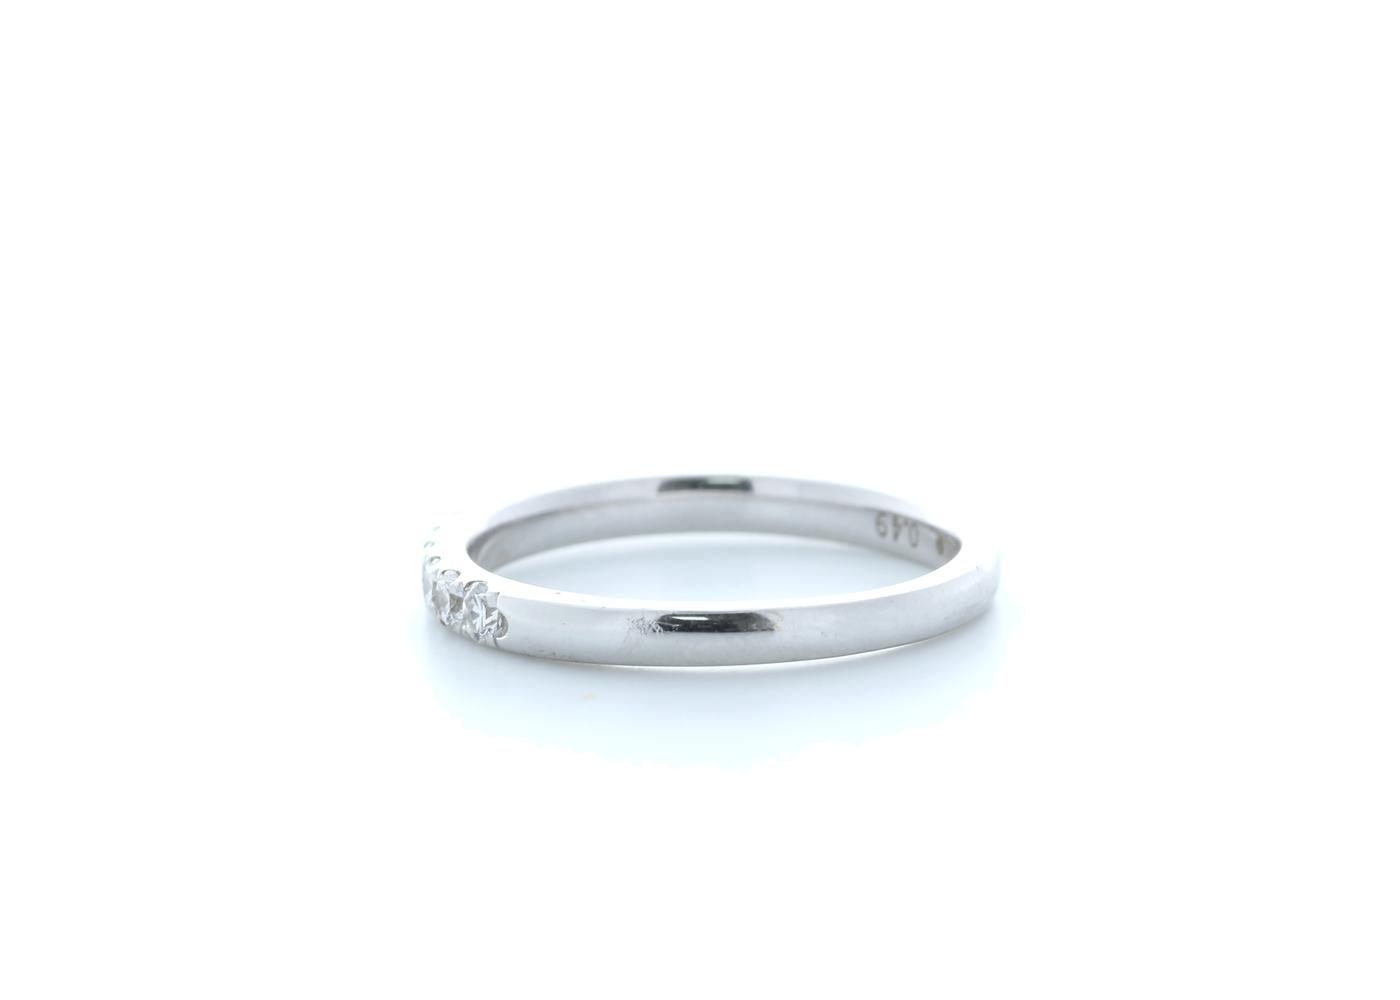 18ct White Gold Claw Set Semi Eternity Diamond Ring 0.17 Carats - Image 3 of 4